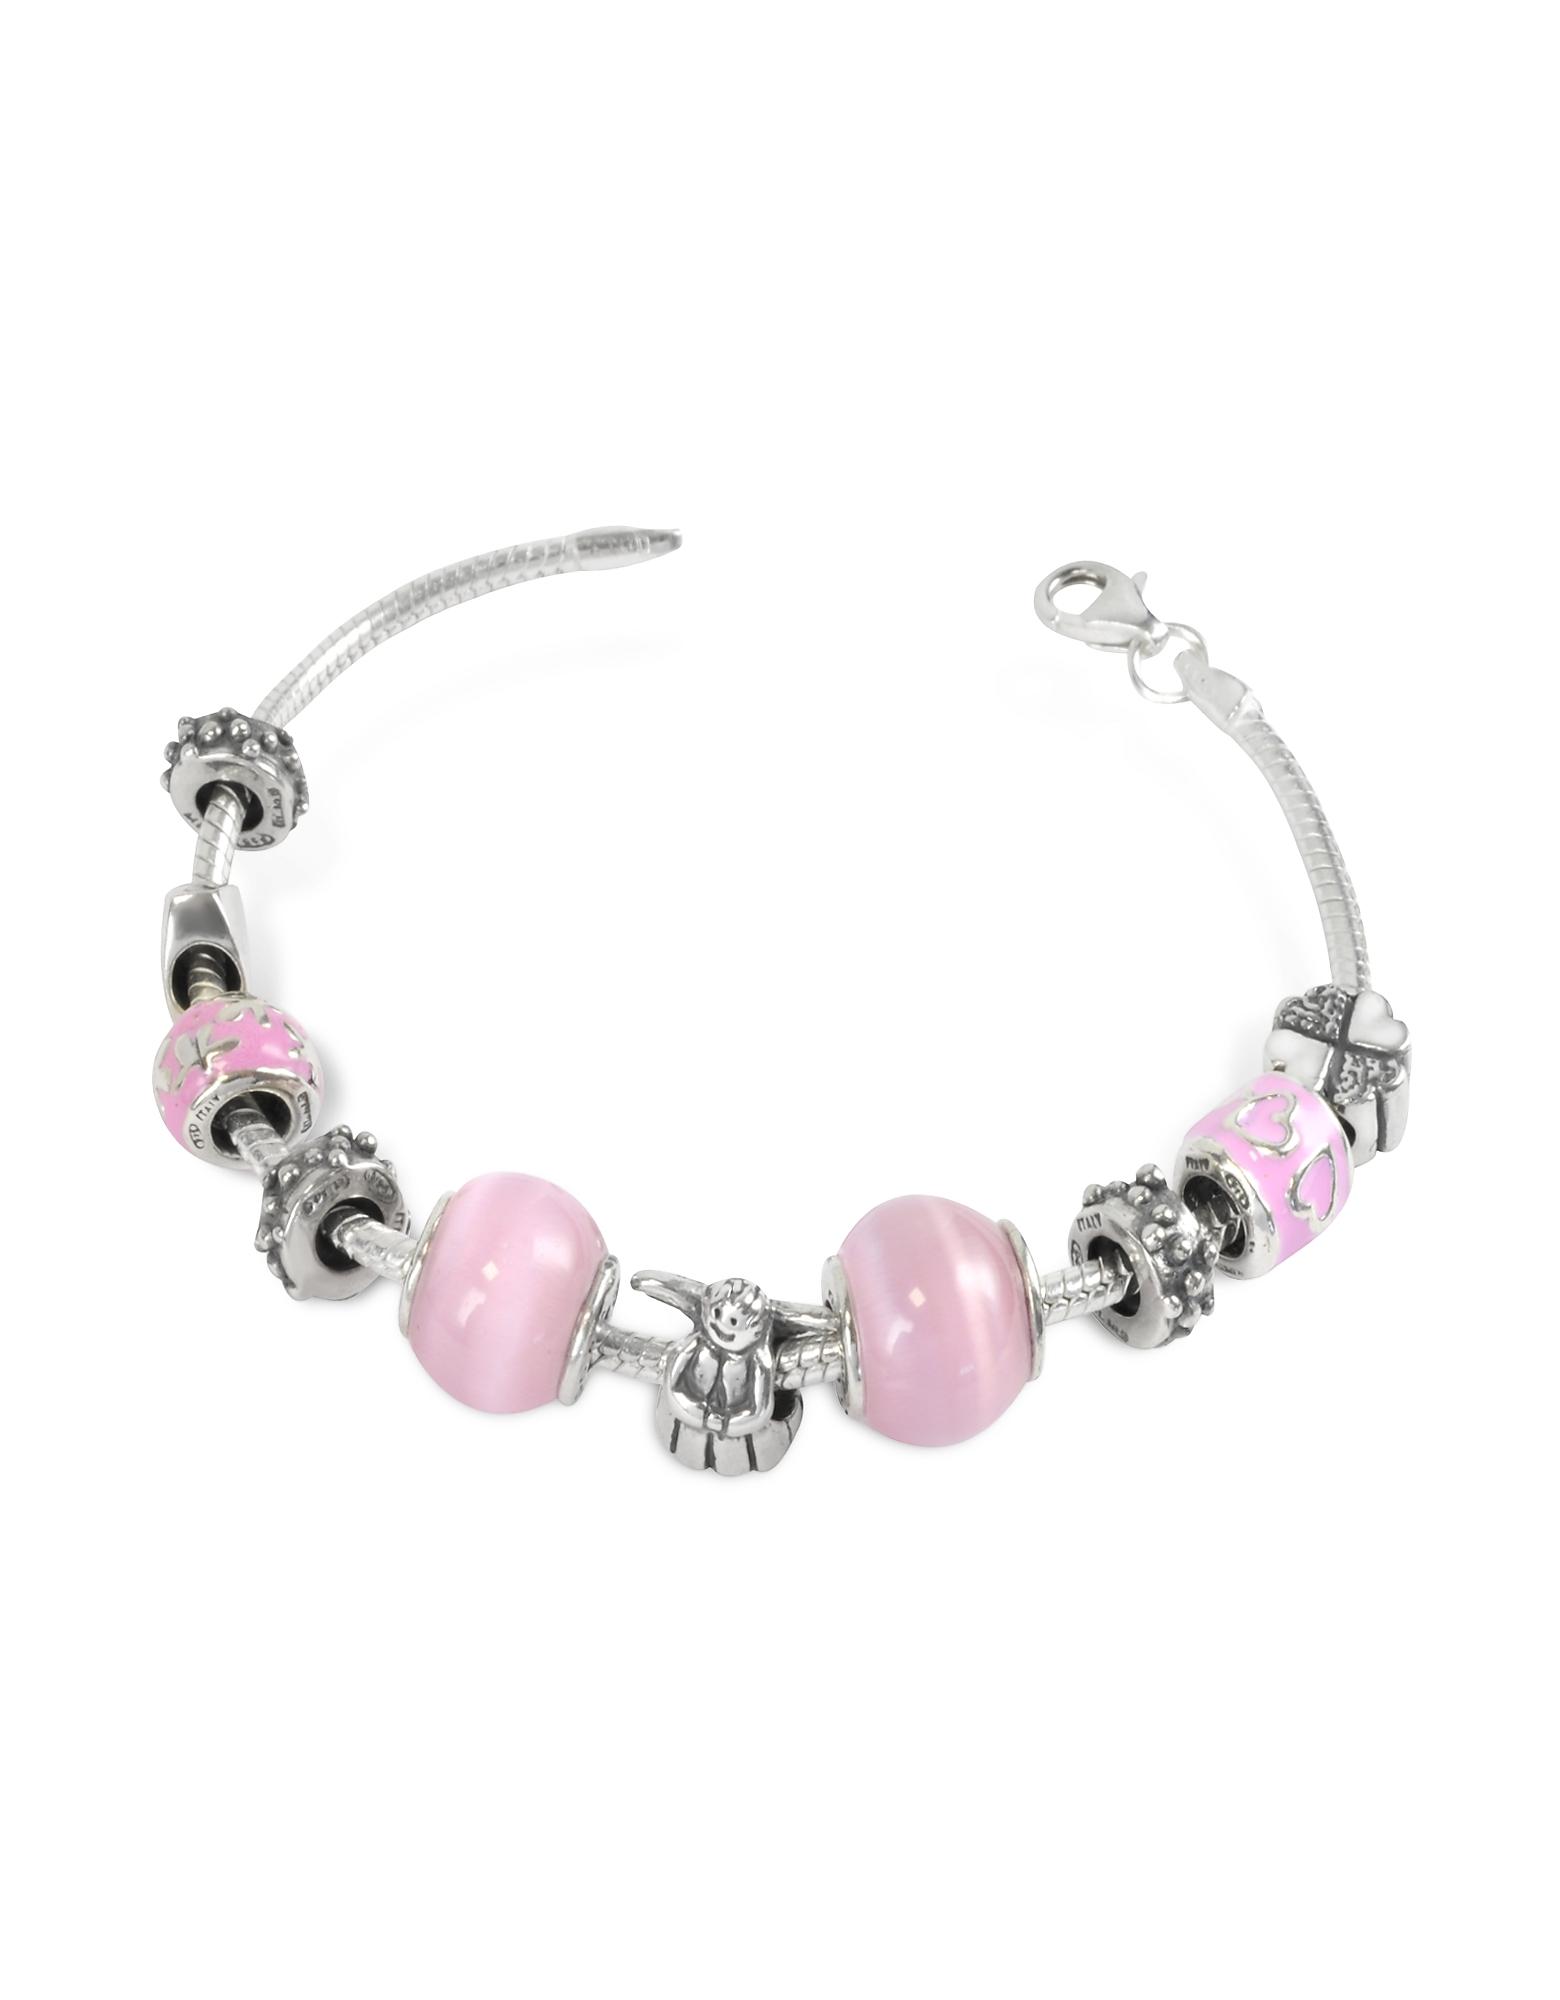 Tedora Bracelets, Sterling Silver Baby Girl Bracelet